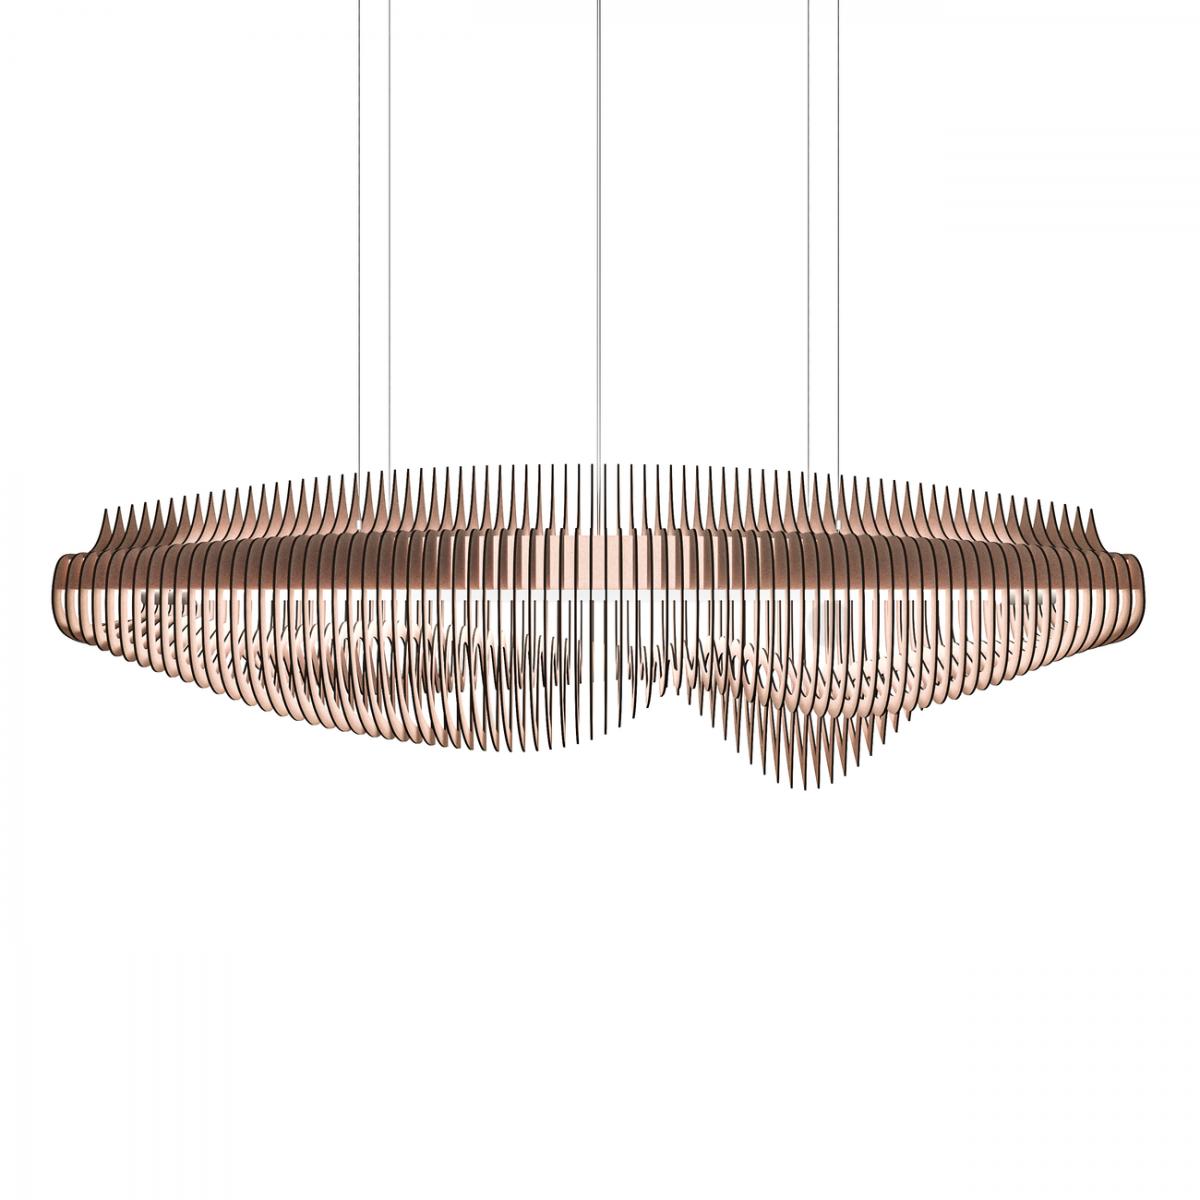 Gausta Hanglamp Elpee Design Exclusieve Dutch Design Verlichting Gimmii Project